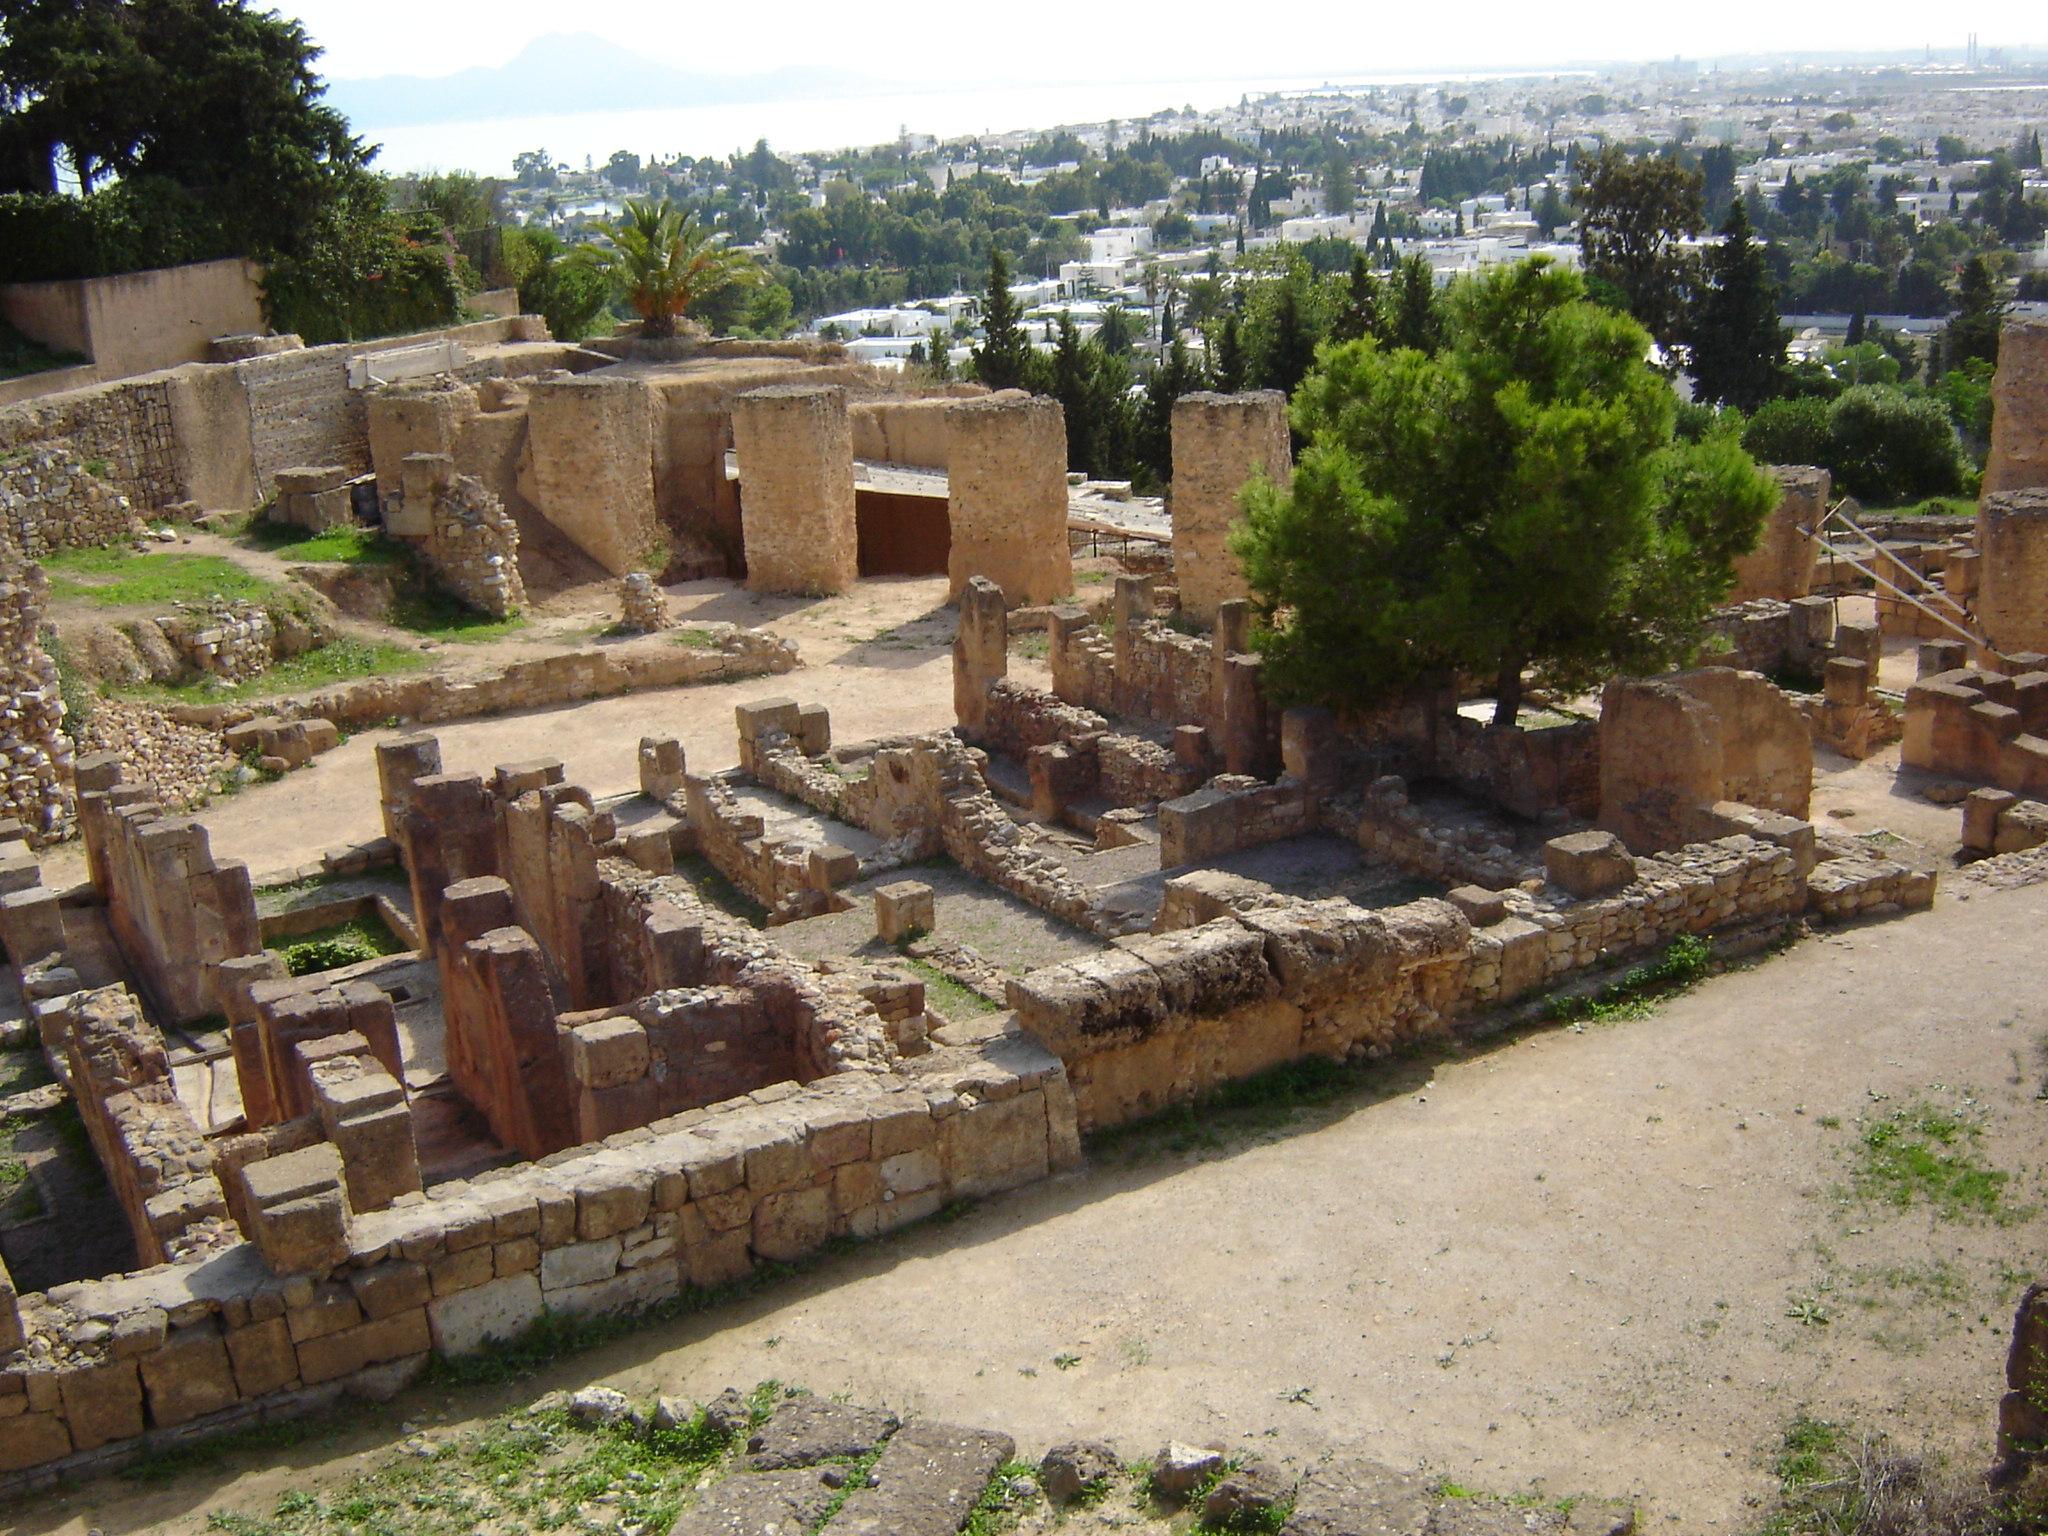 https://i1.wp.com/upload.wikimedia.org/wikipedia/commons/5/52/Quartier_Punique.JPG